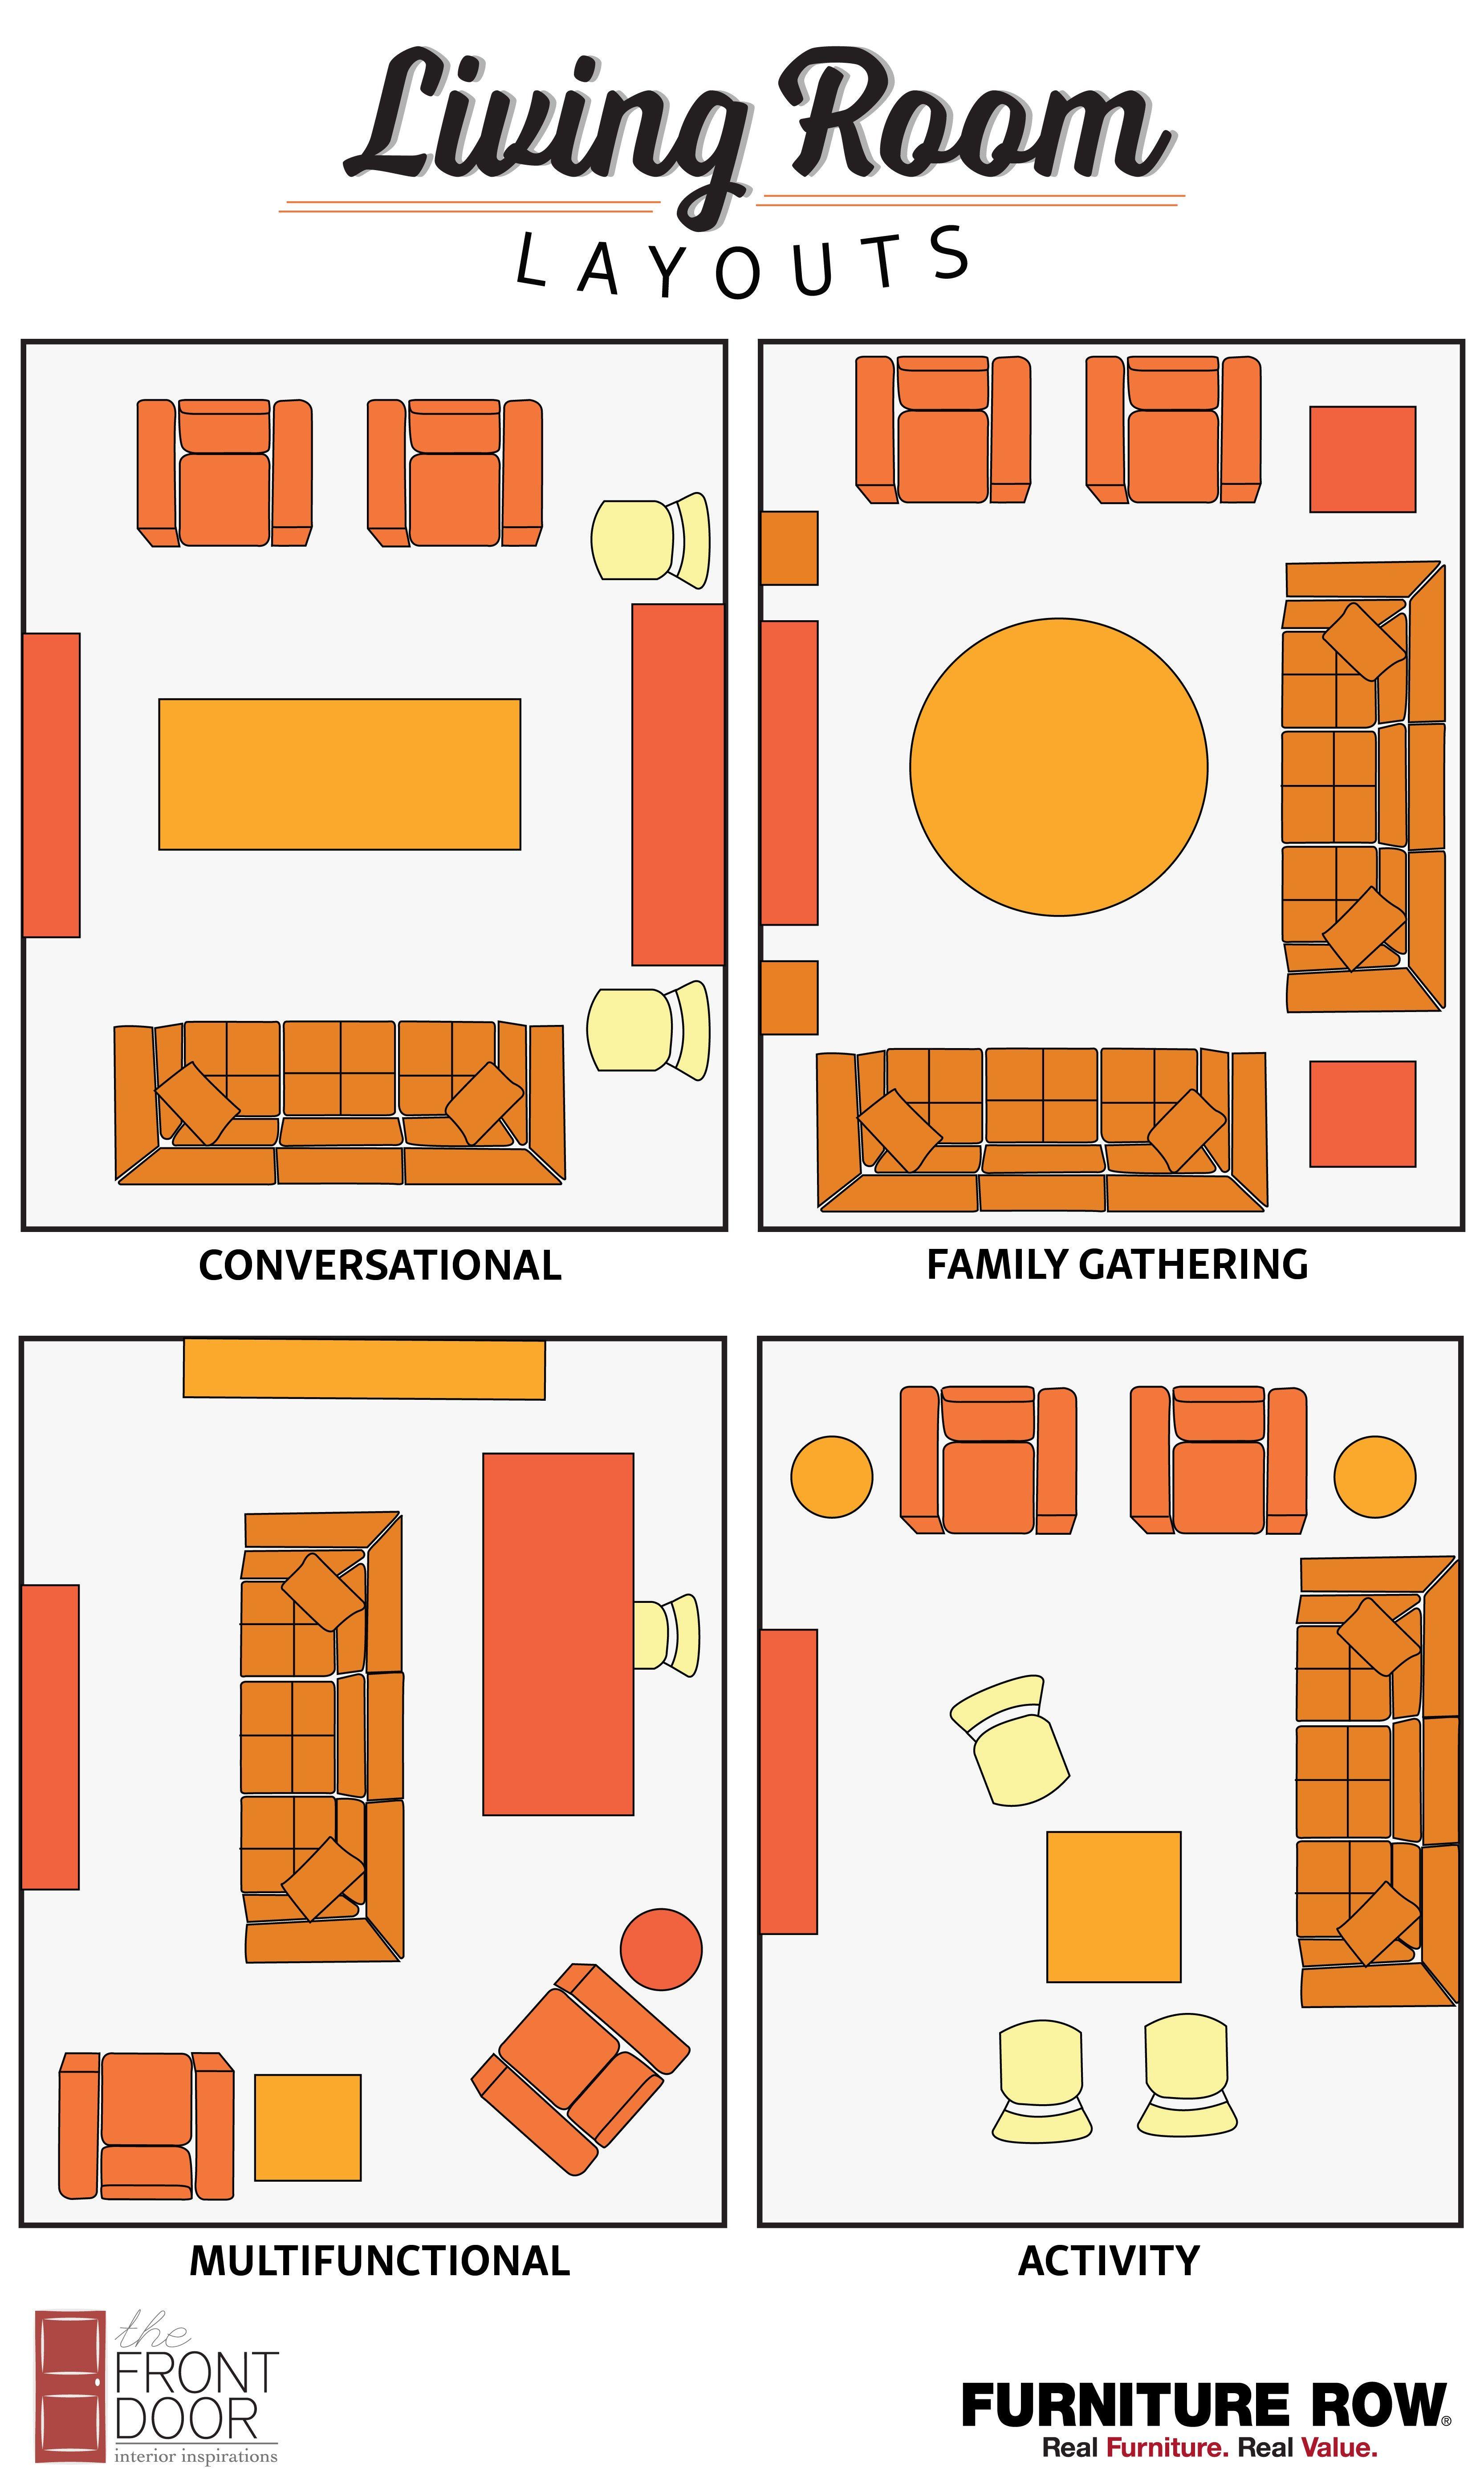 Living Room Layout Modern Apartment Decor Guide Inspiration Pinterest